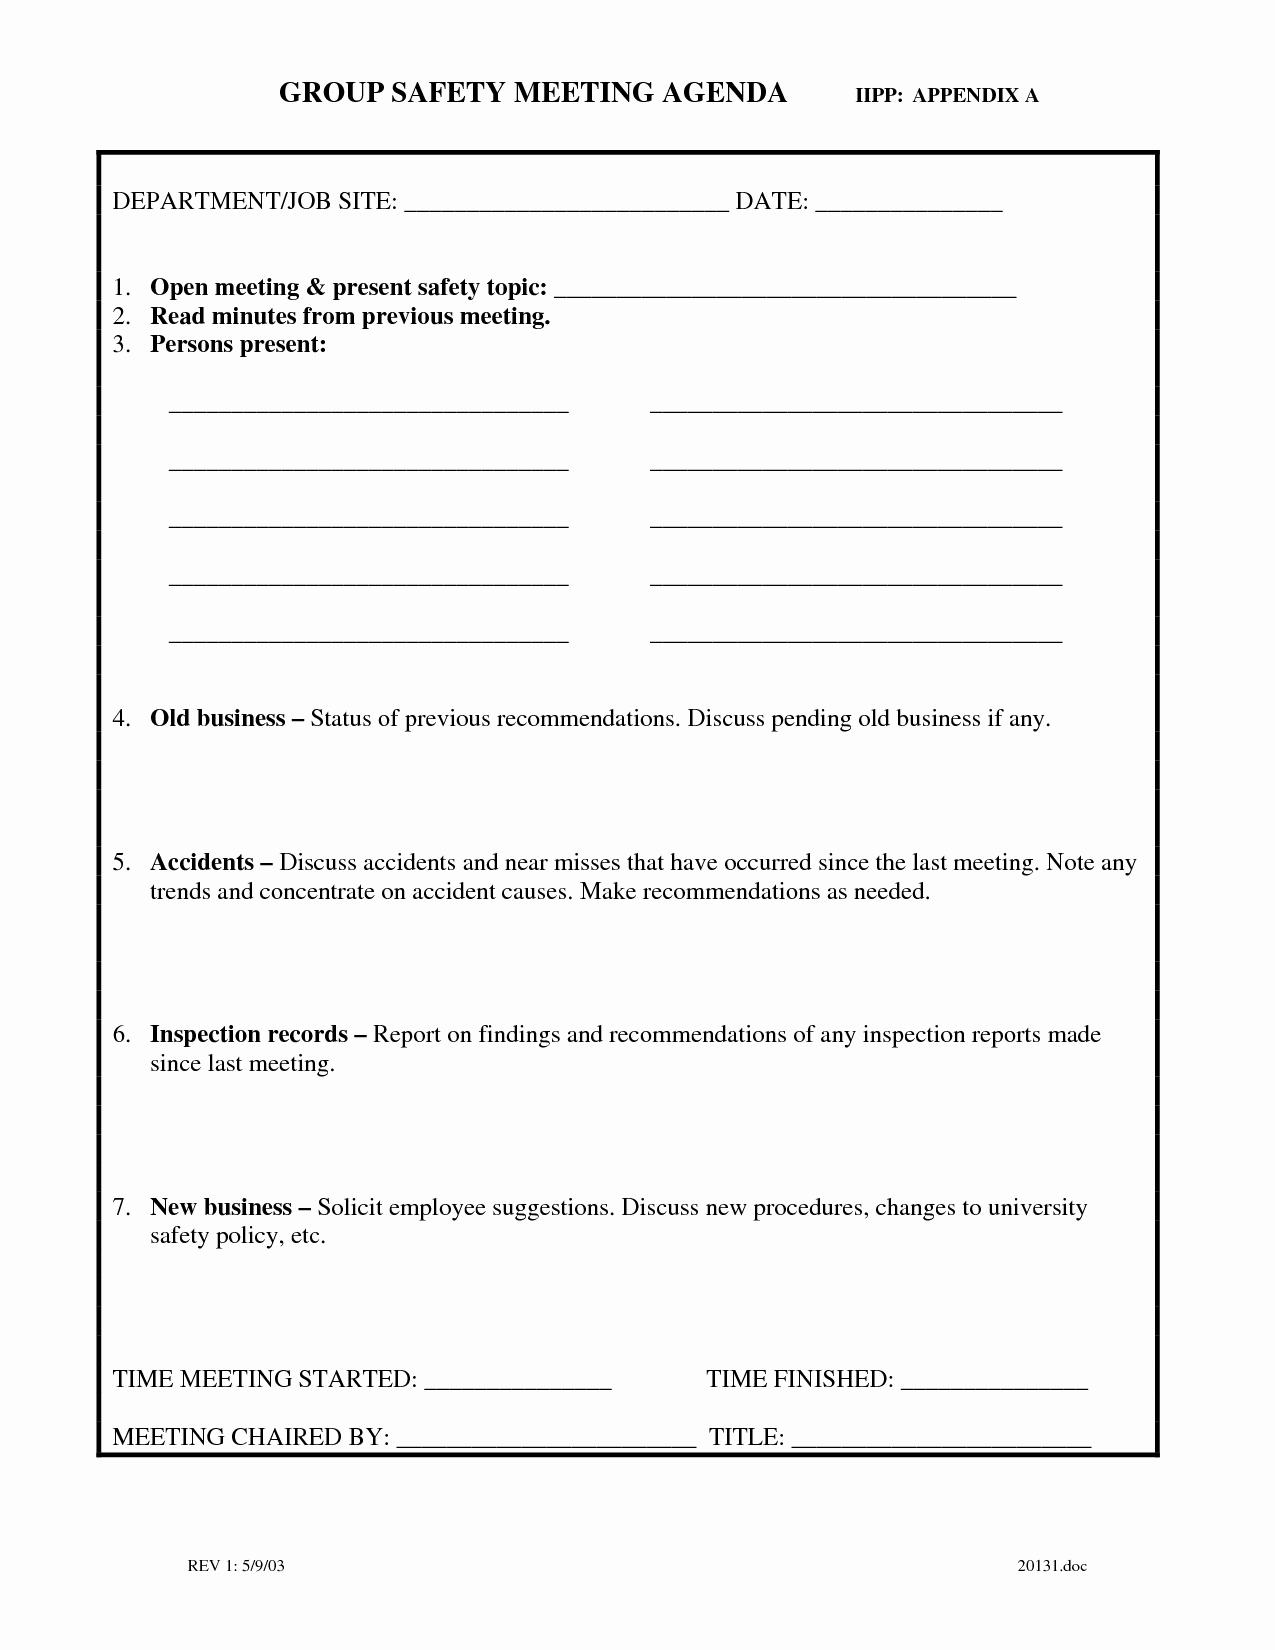 Safety Meeting Minutes Template Elegant Agenda forms Portablegasgrillweber